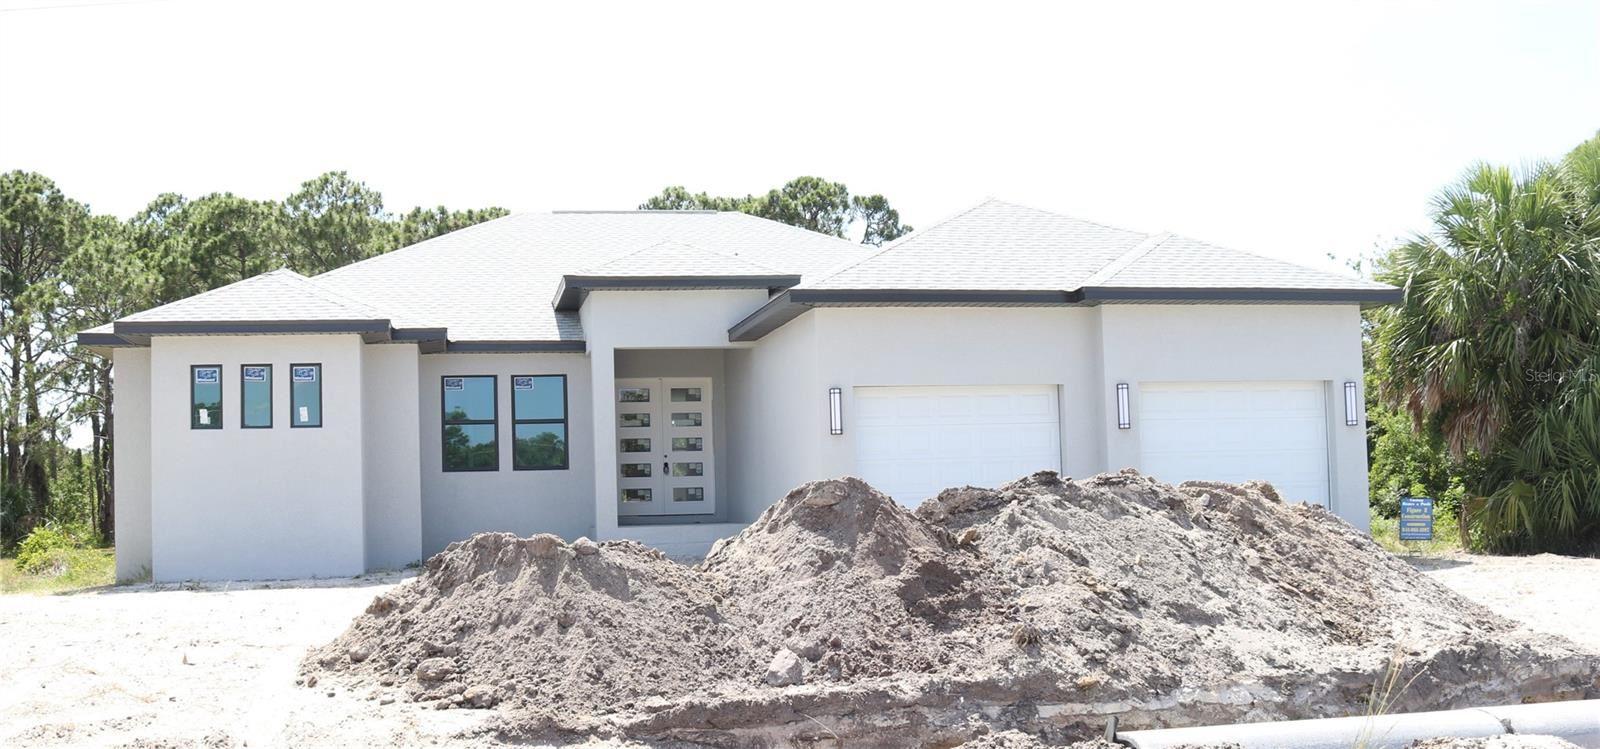 237 WEST PINE VALLEY LANE, Rotonda, FL 33947 - MLS#: A4501821